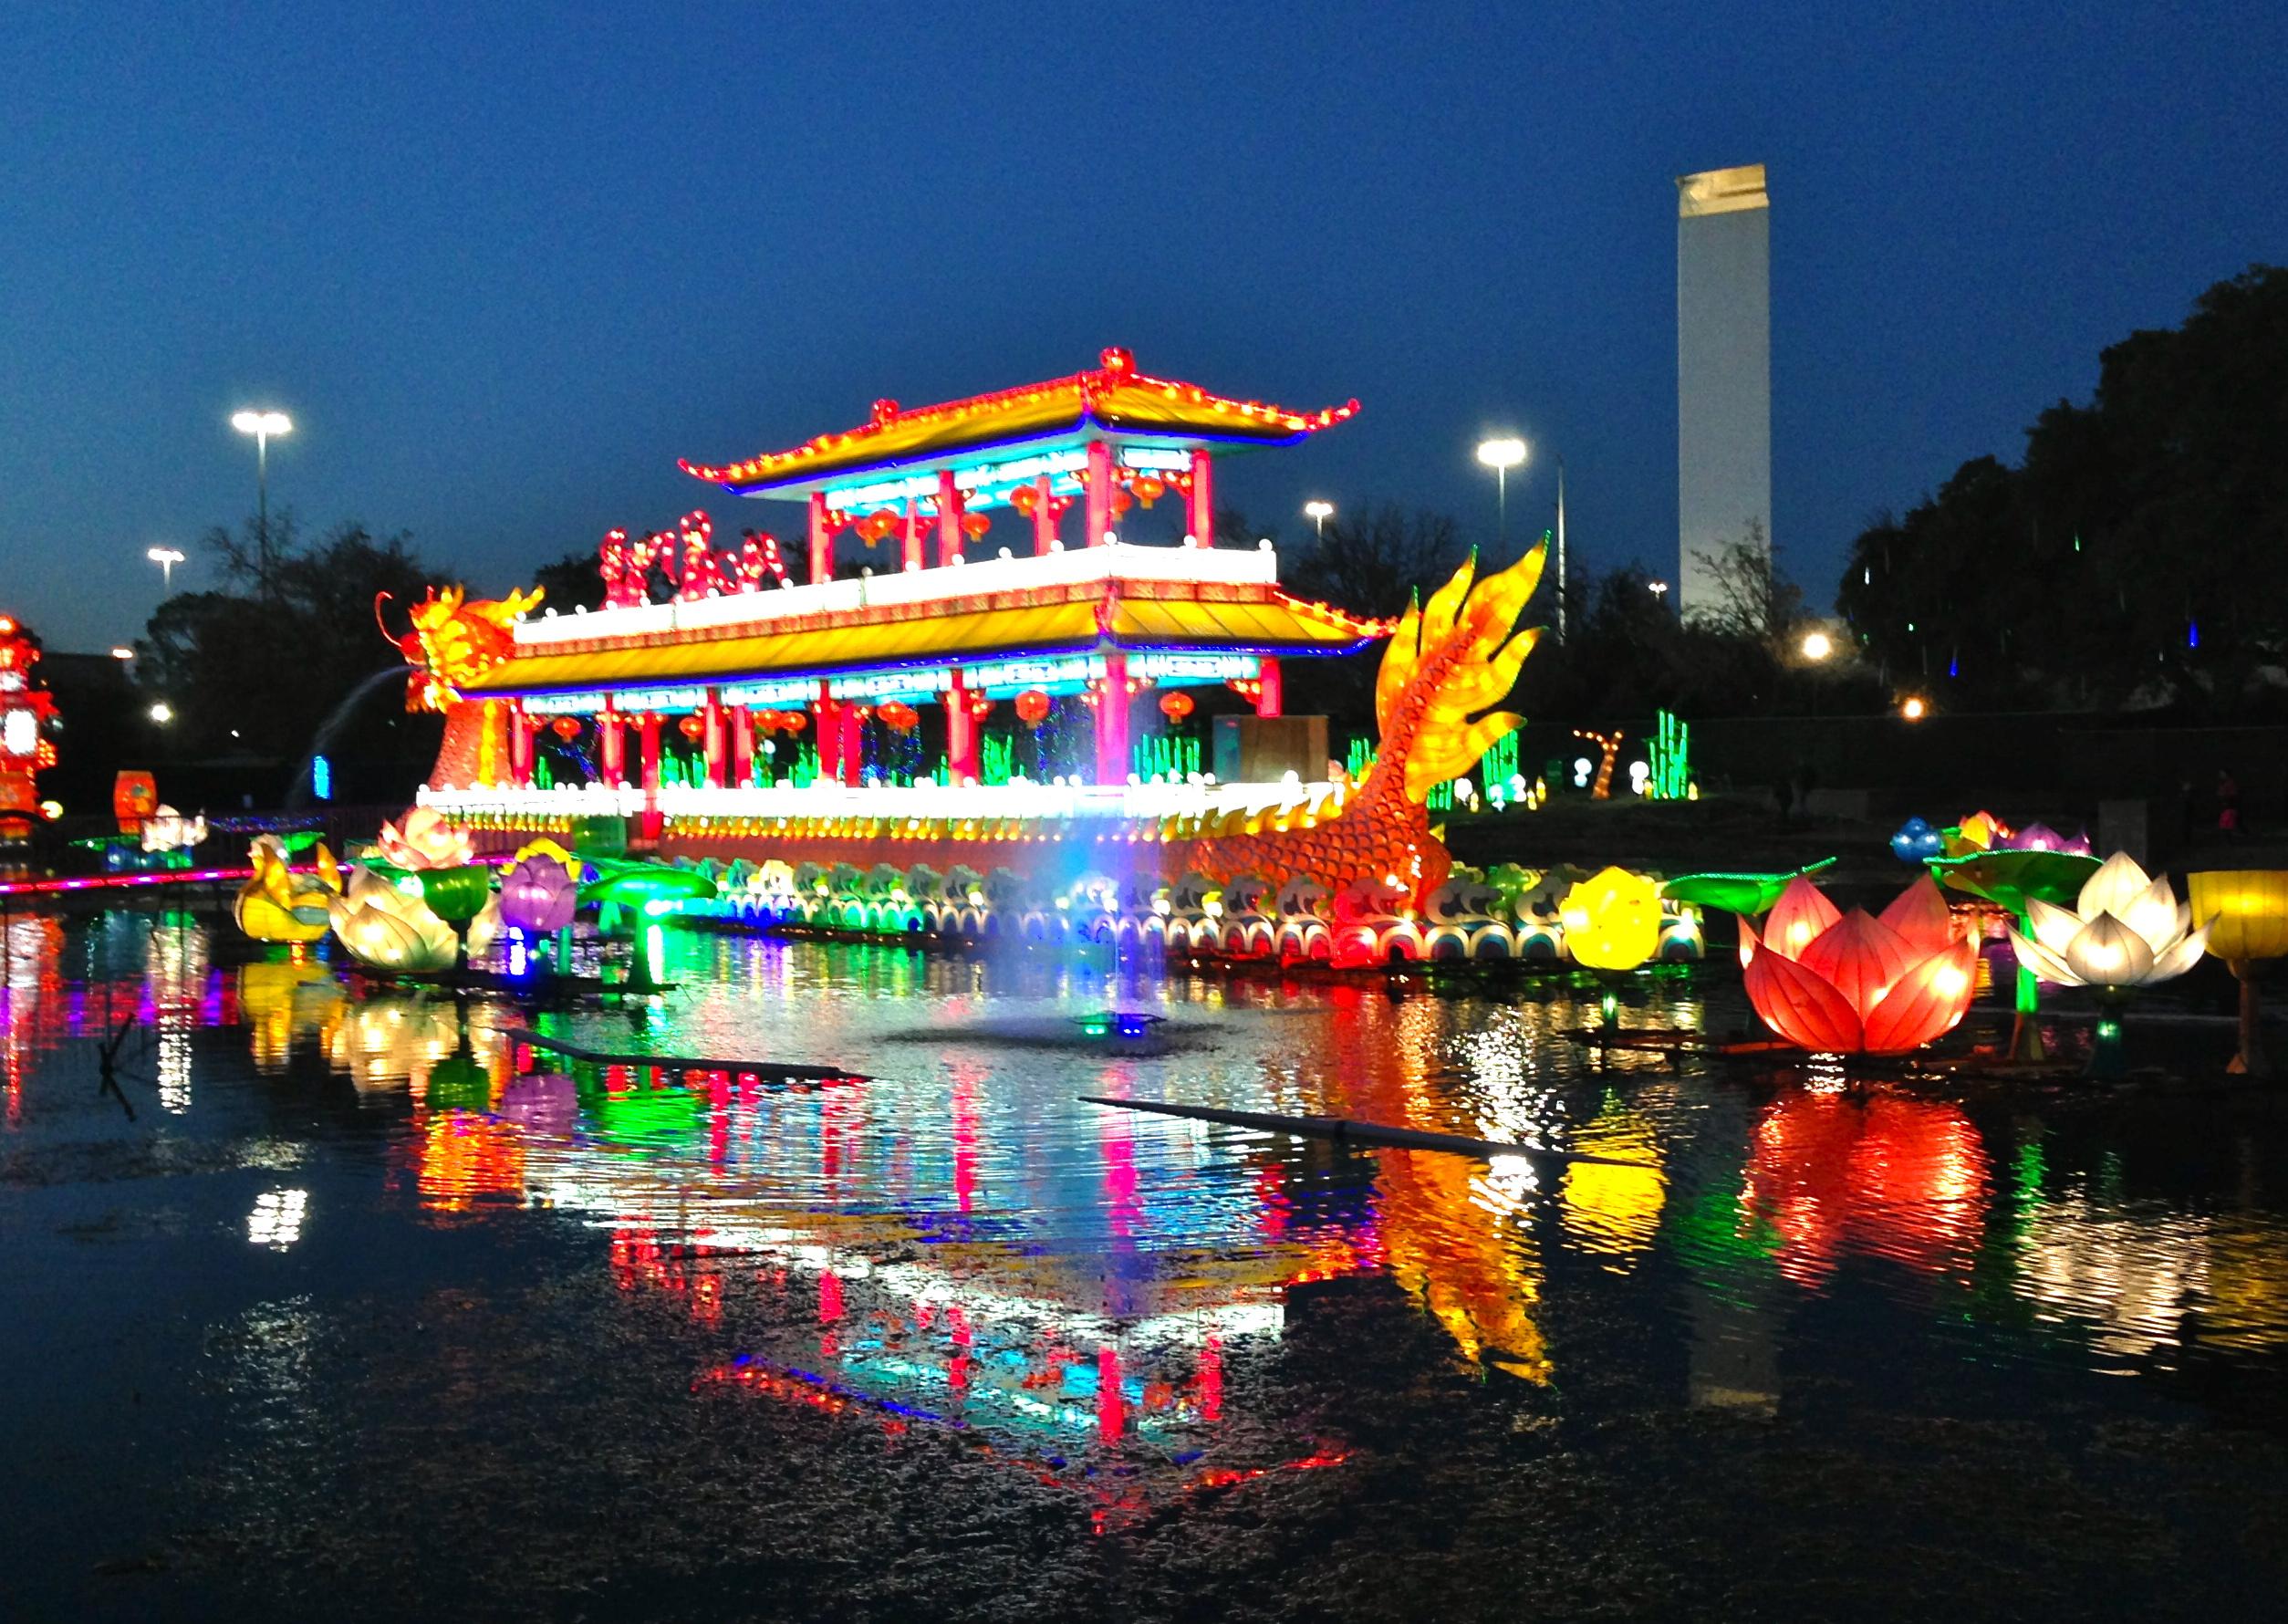 dallas chinese lantern festival | WORLDROMPER